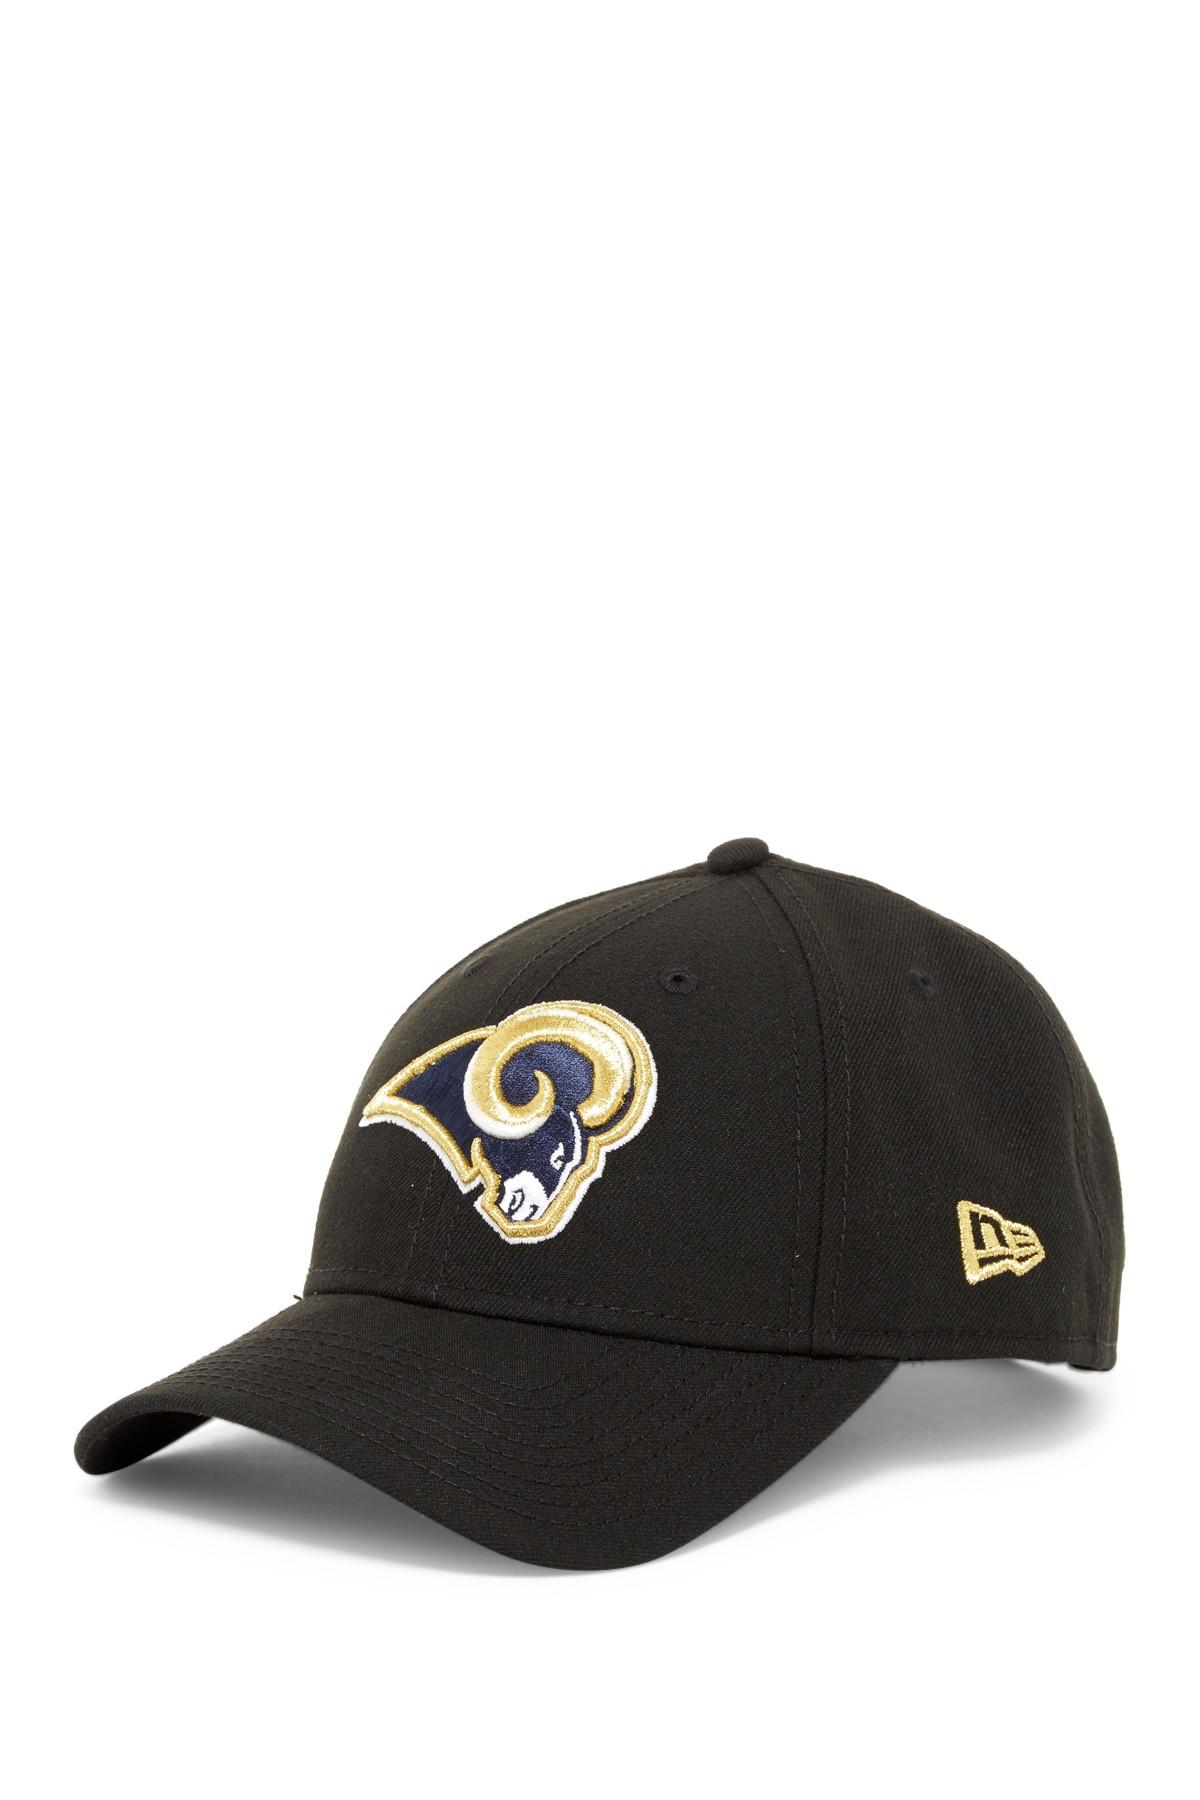 Ktz Nfl Los Angeles Rams Black Twill Football Cap In Black